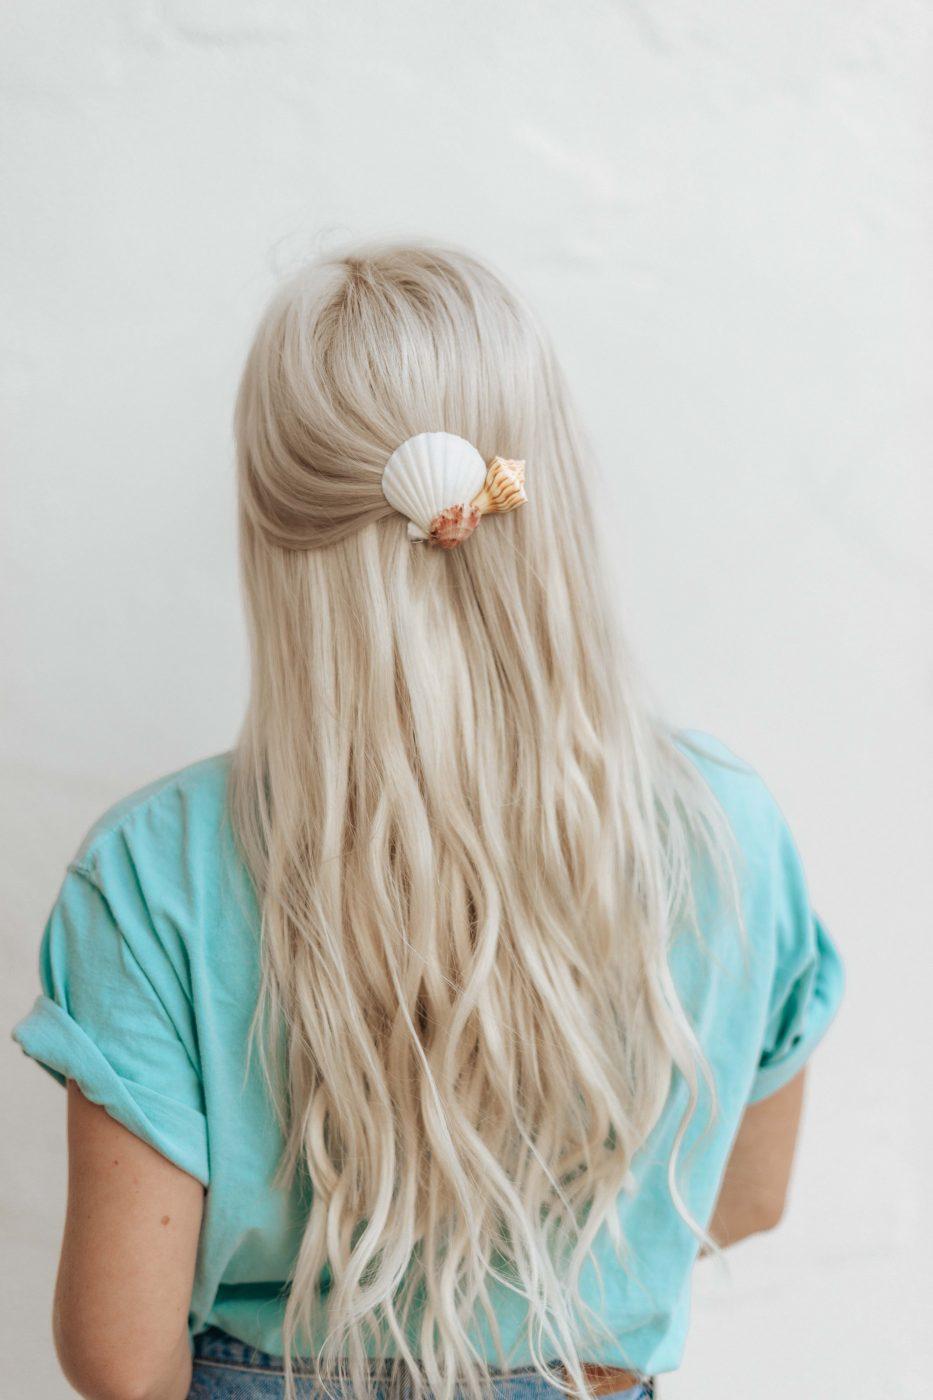 DIY Seashell Hair Clip - Sweet Teal by Jenny Bess